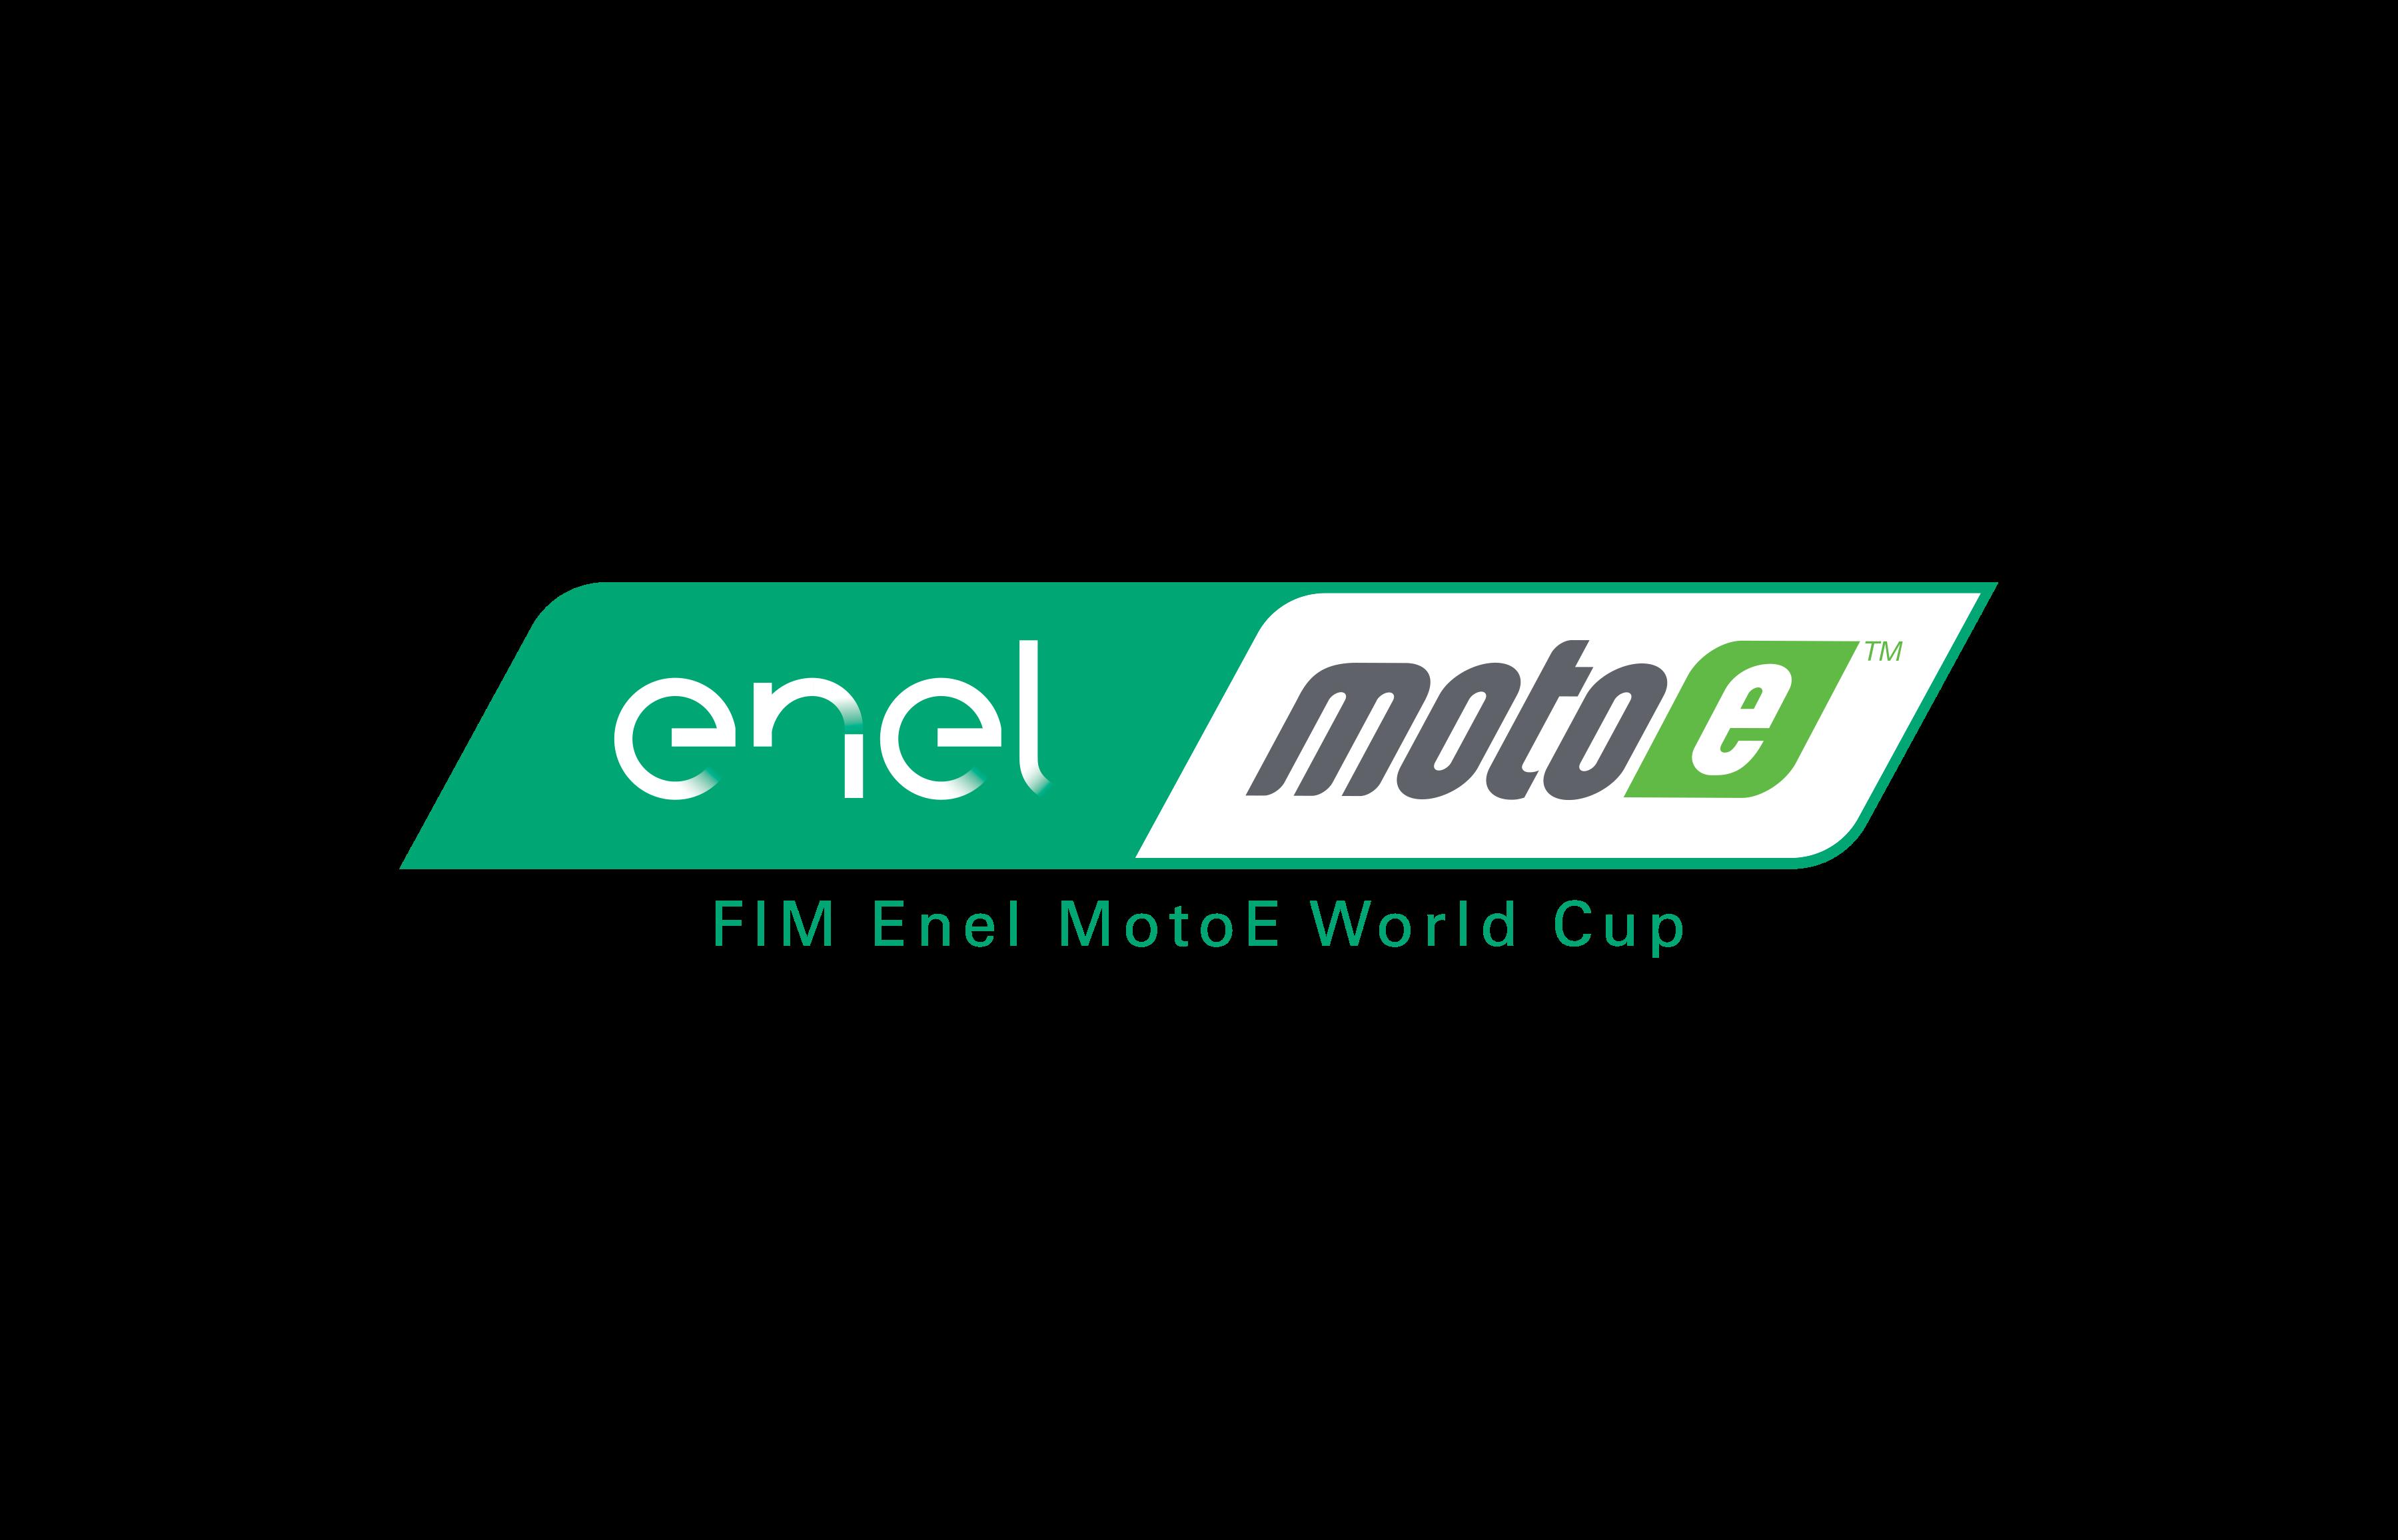 FIM Enel MotoE™ World Cup